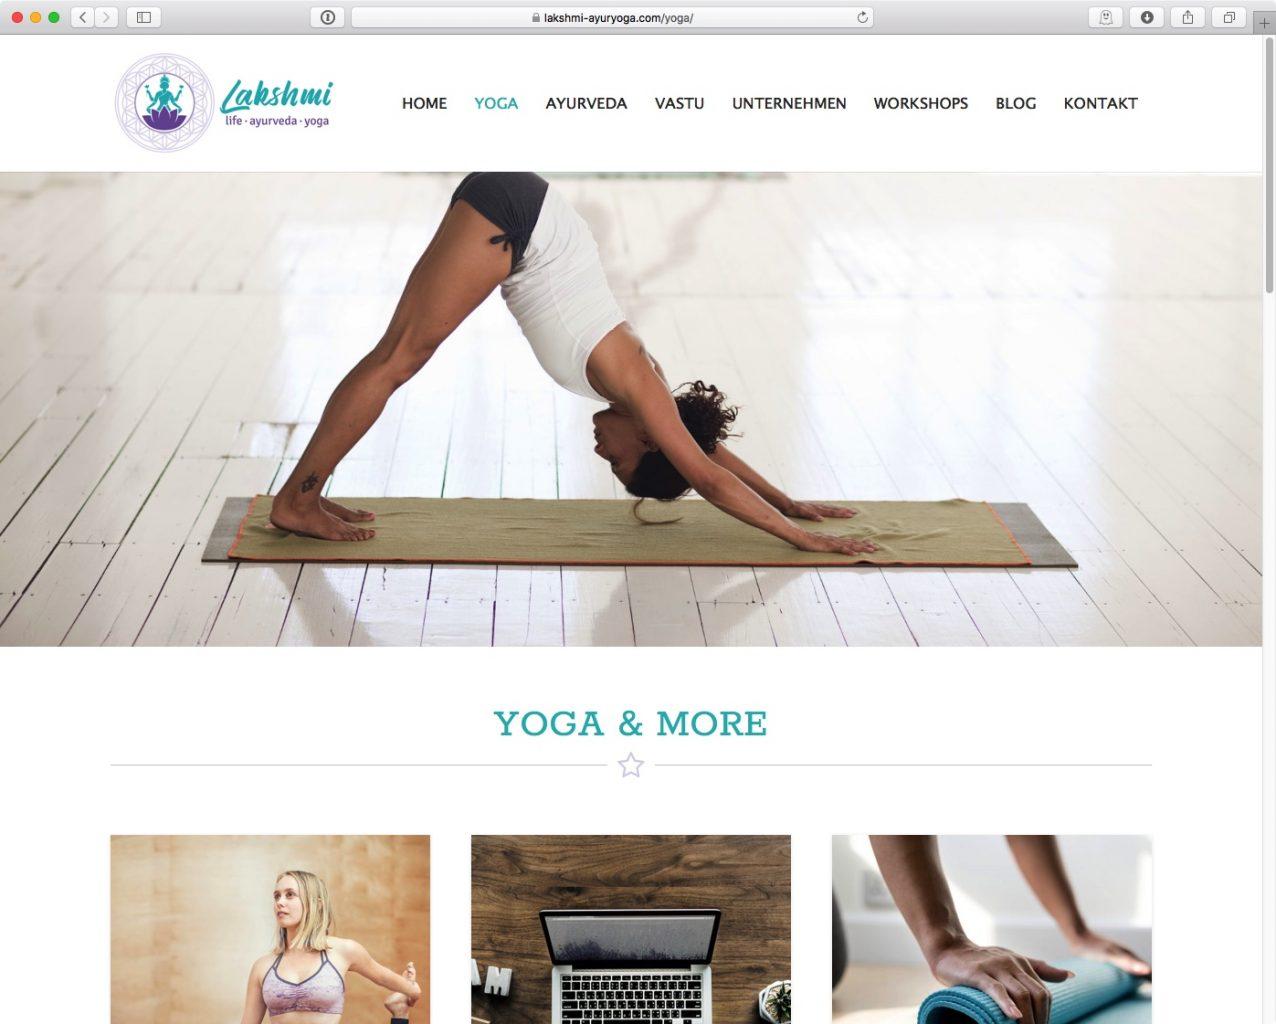 Lakshmi Ayuryoga - Yoga